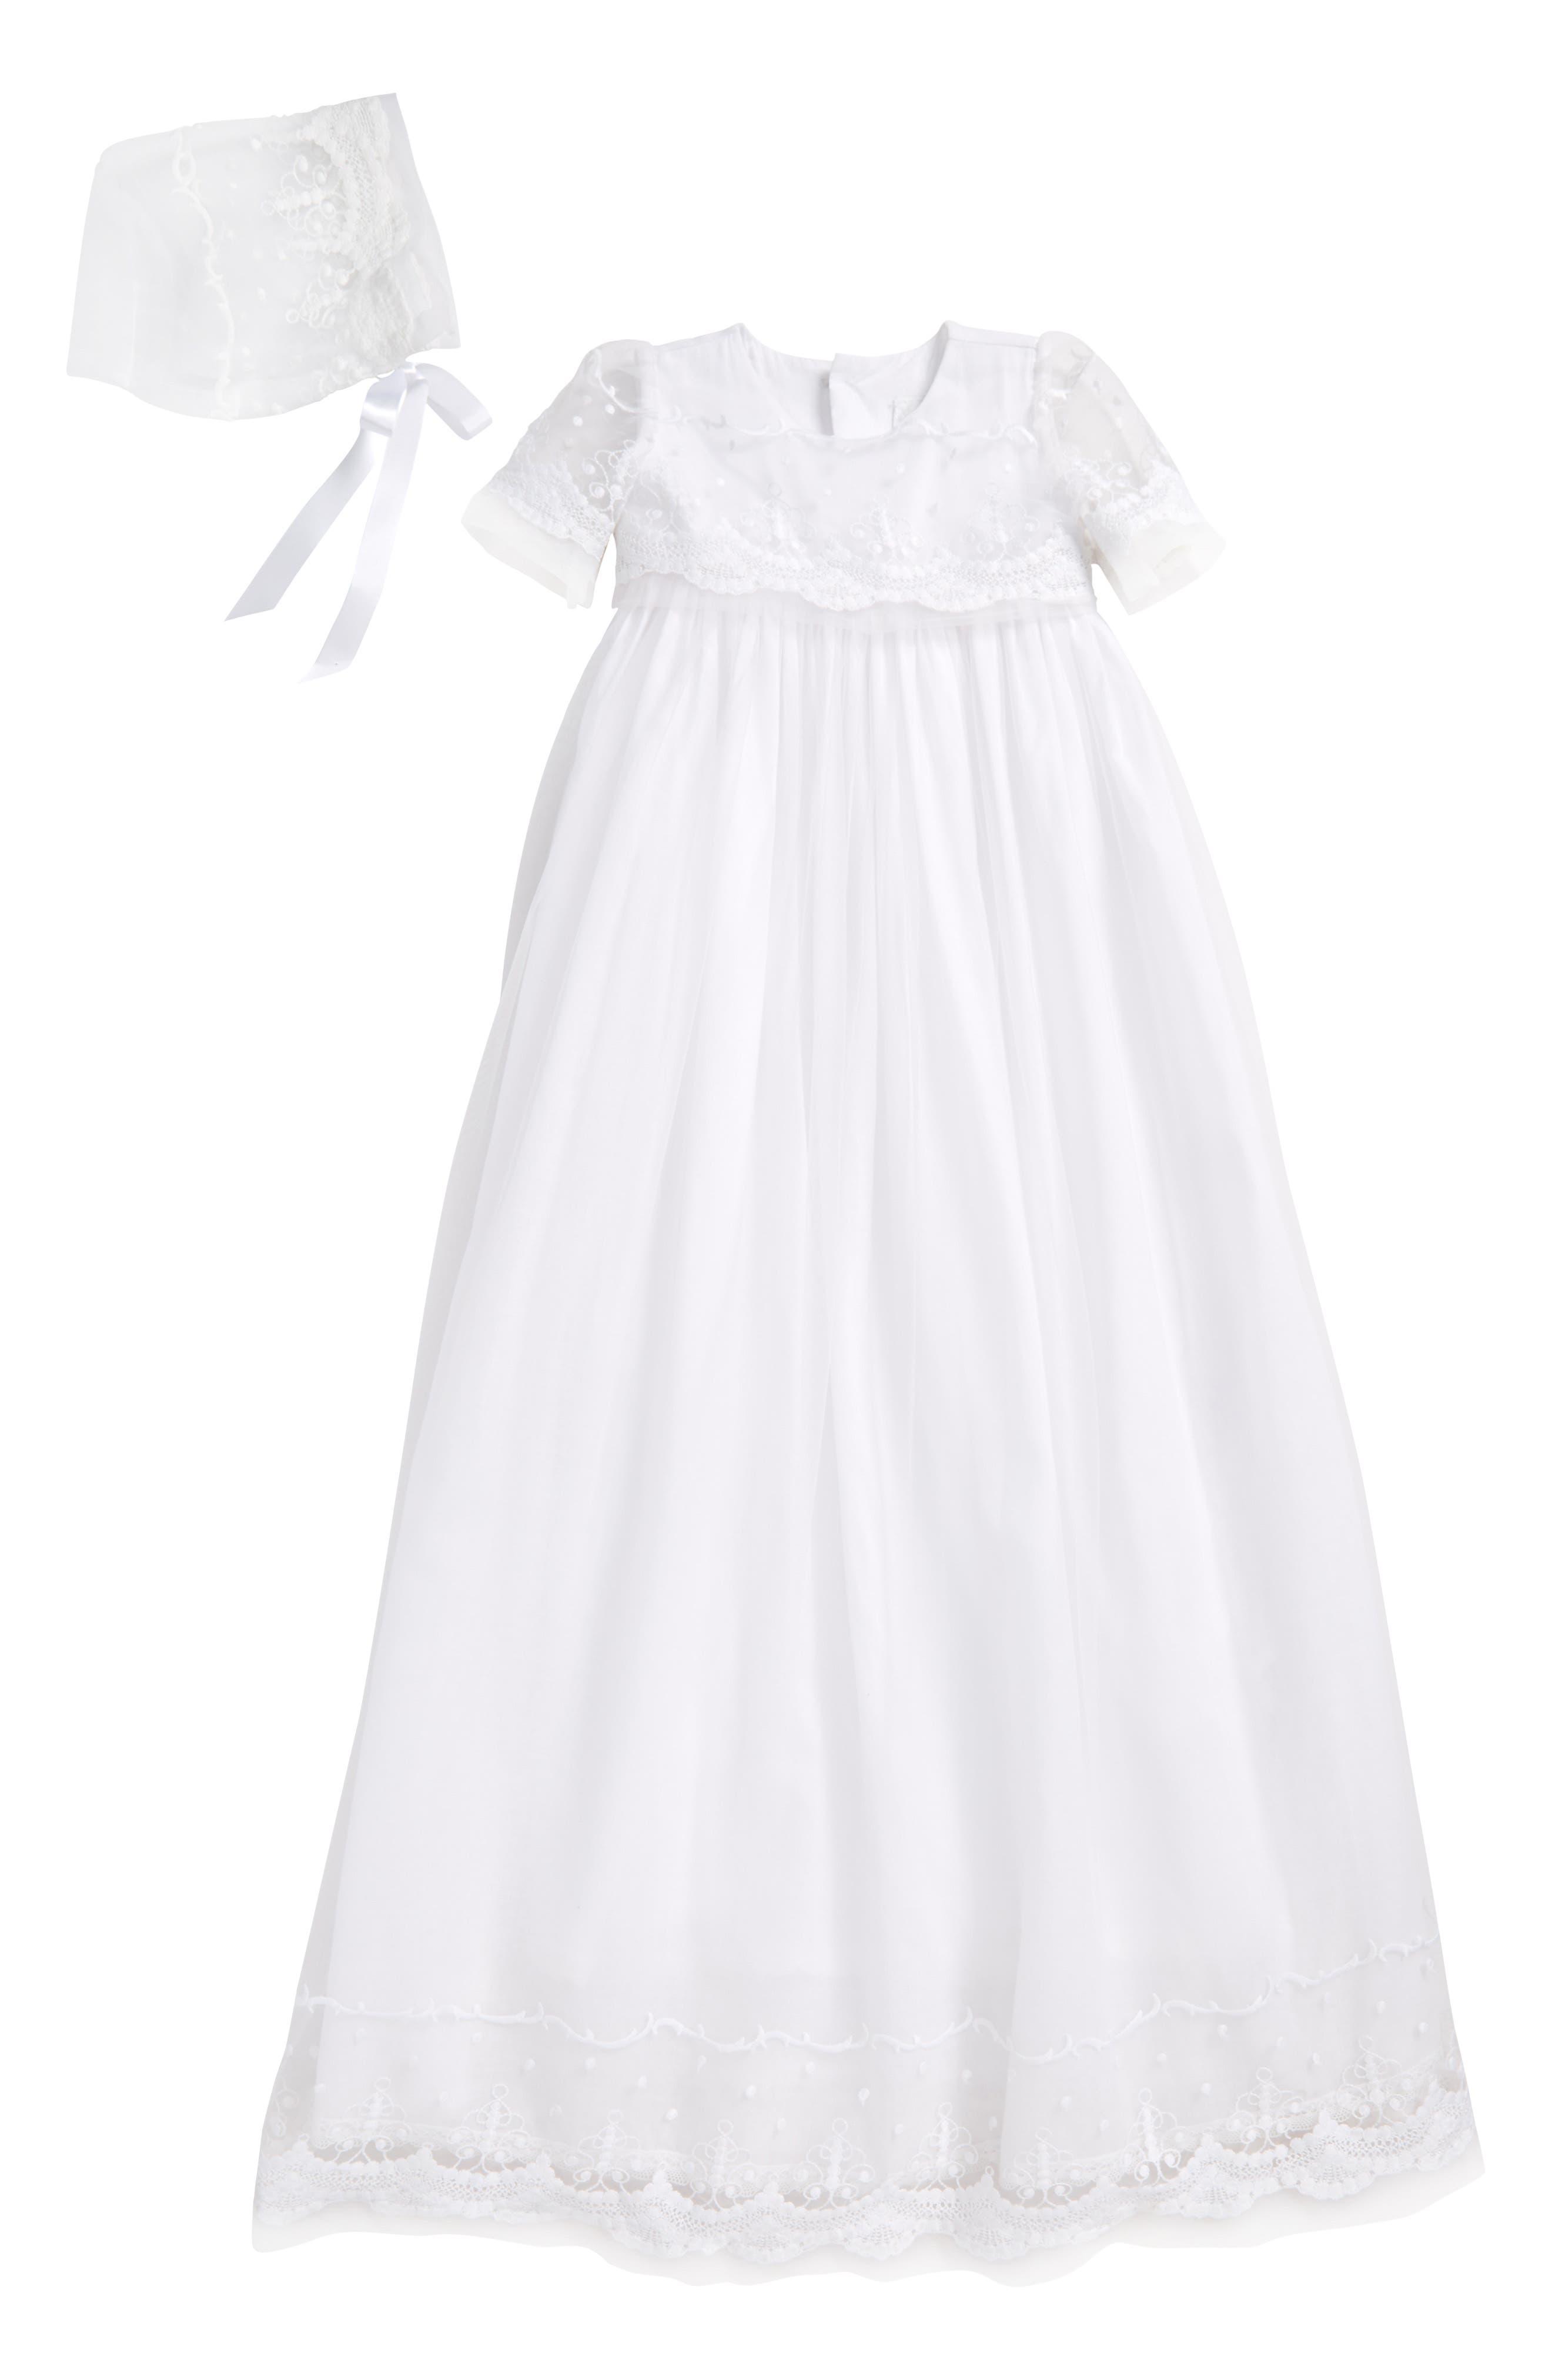 Blessing Christening Gown & Bonnet Set,                             Main thumbnail 1, color,                             White